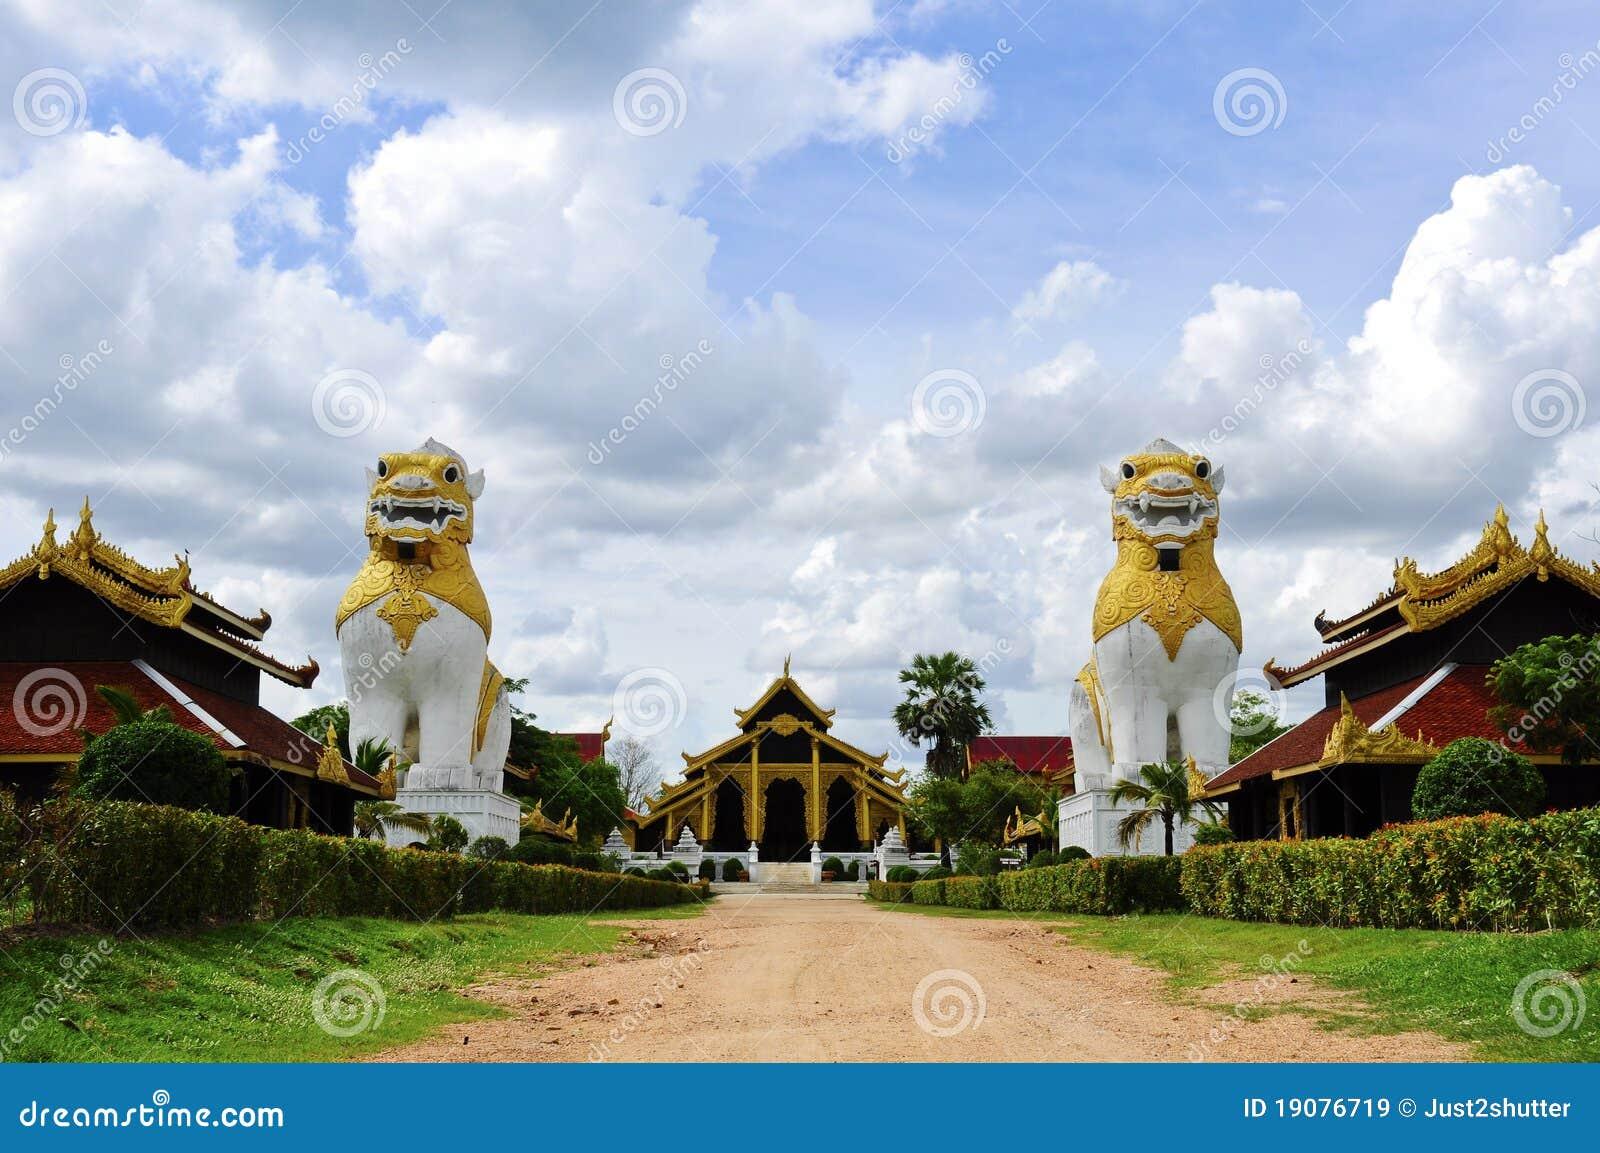 Leeuw twee bij Surasri Kamp, Kanchanaburi, Thailand